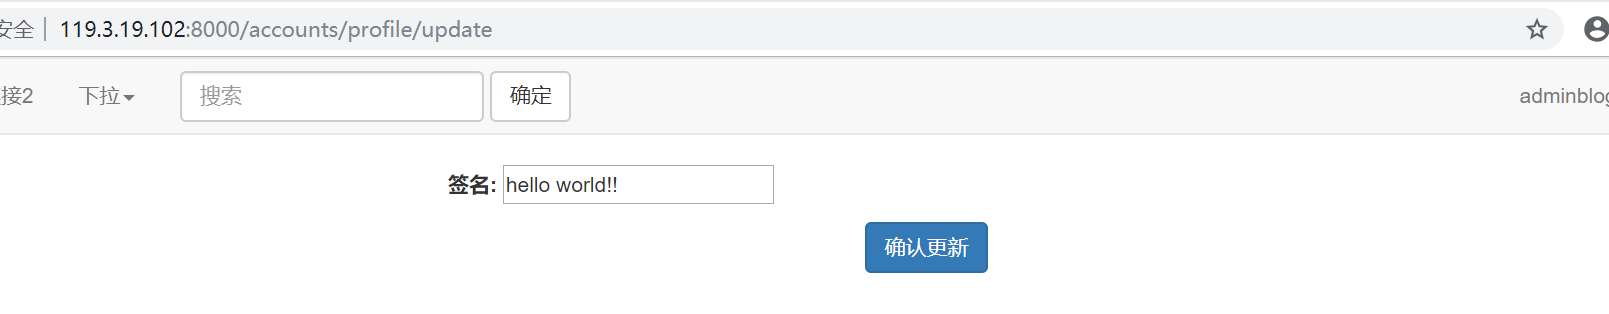 jerrycoding Django建站历程:(七)添加用户签名字段